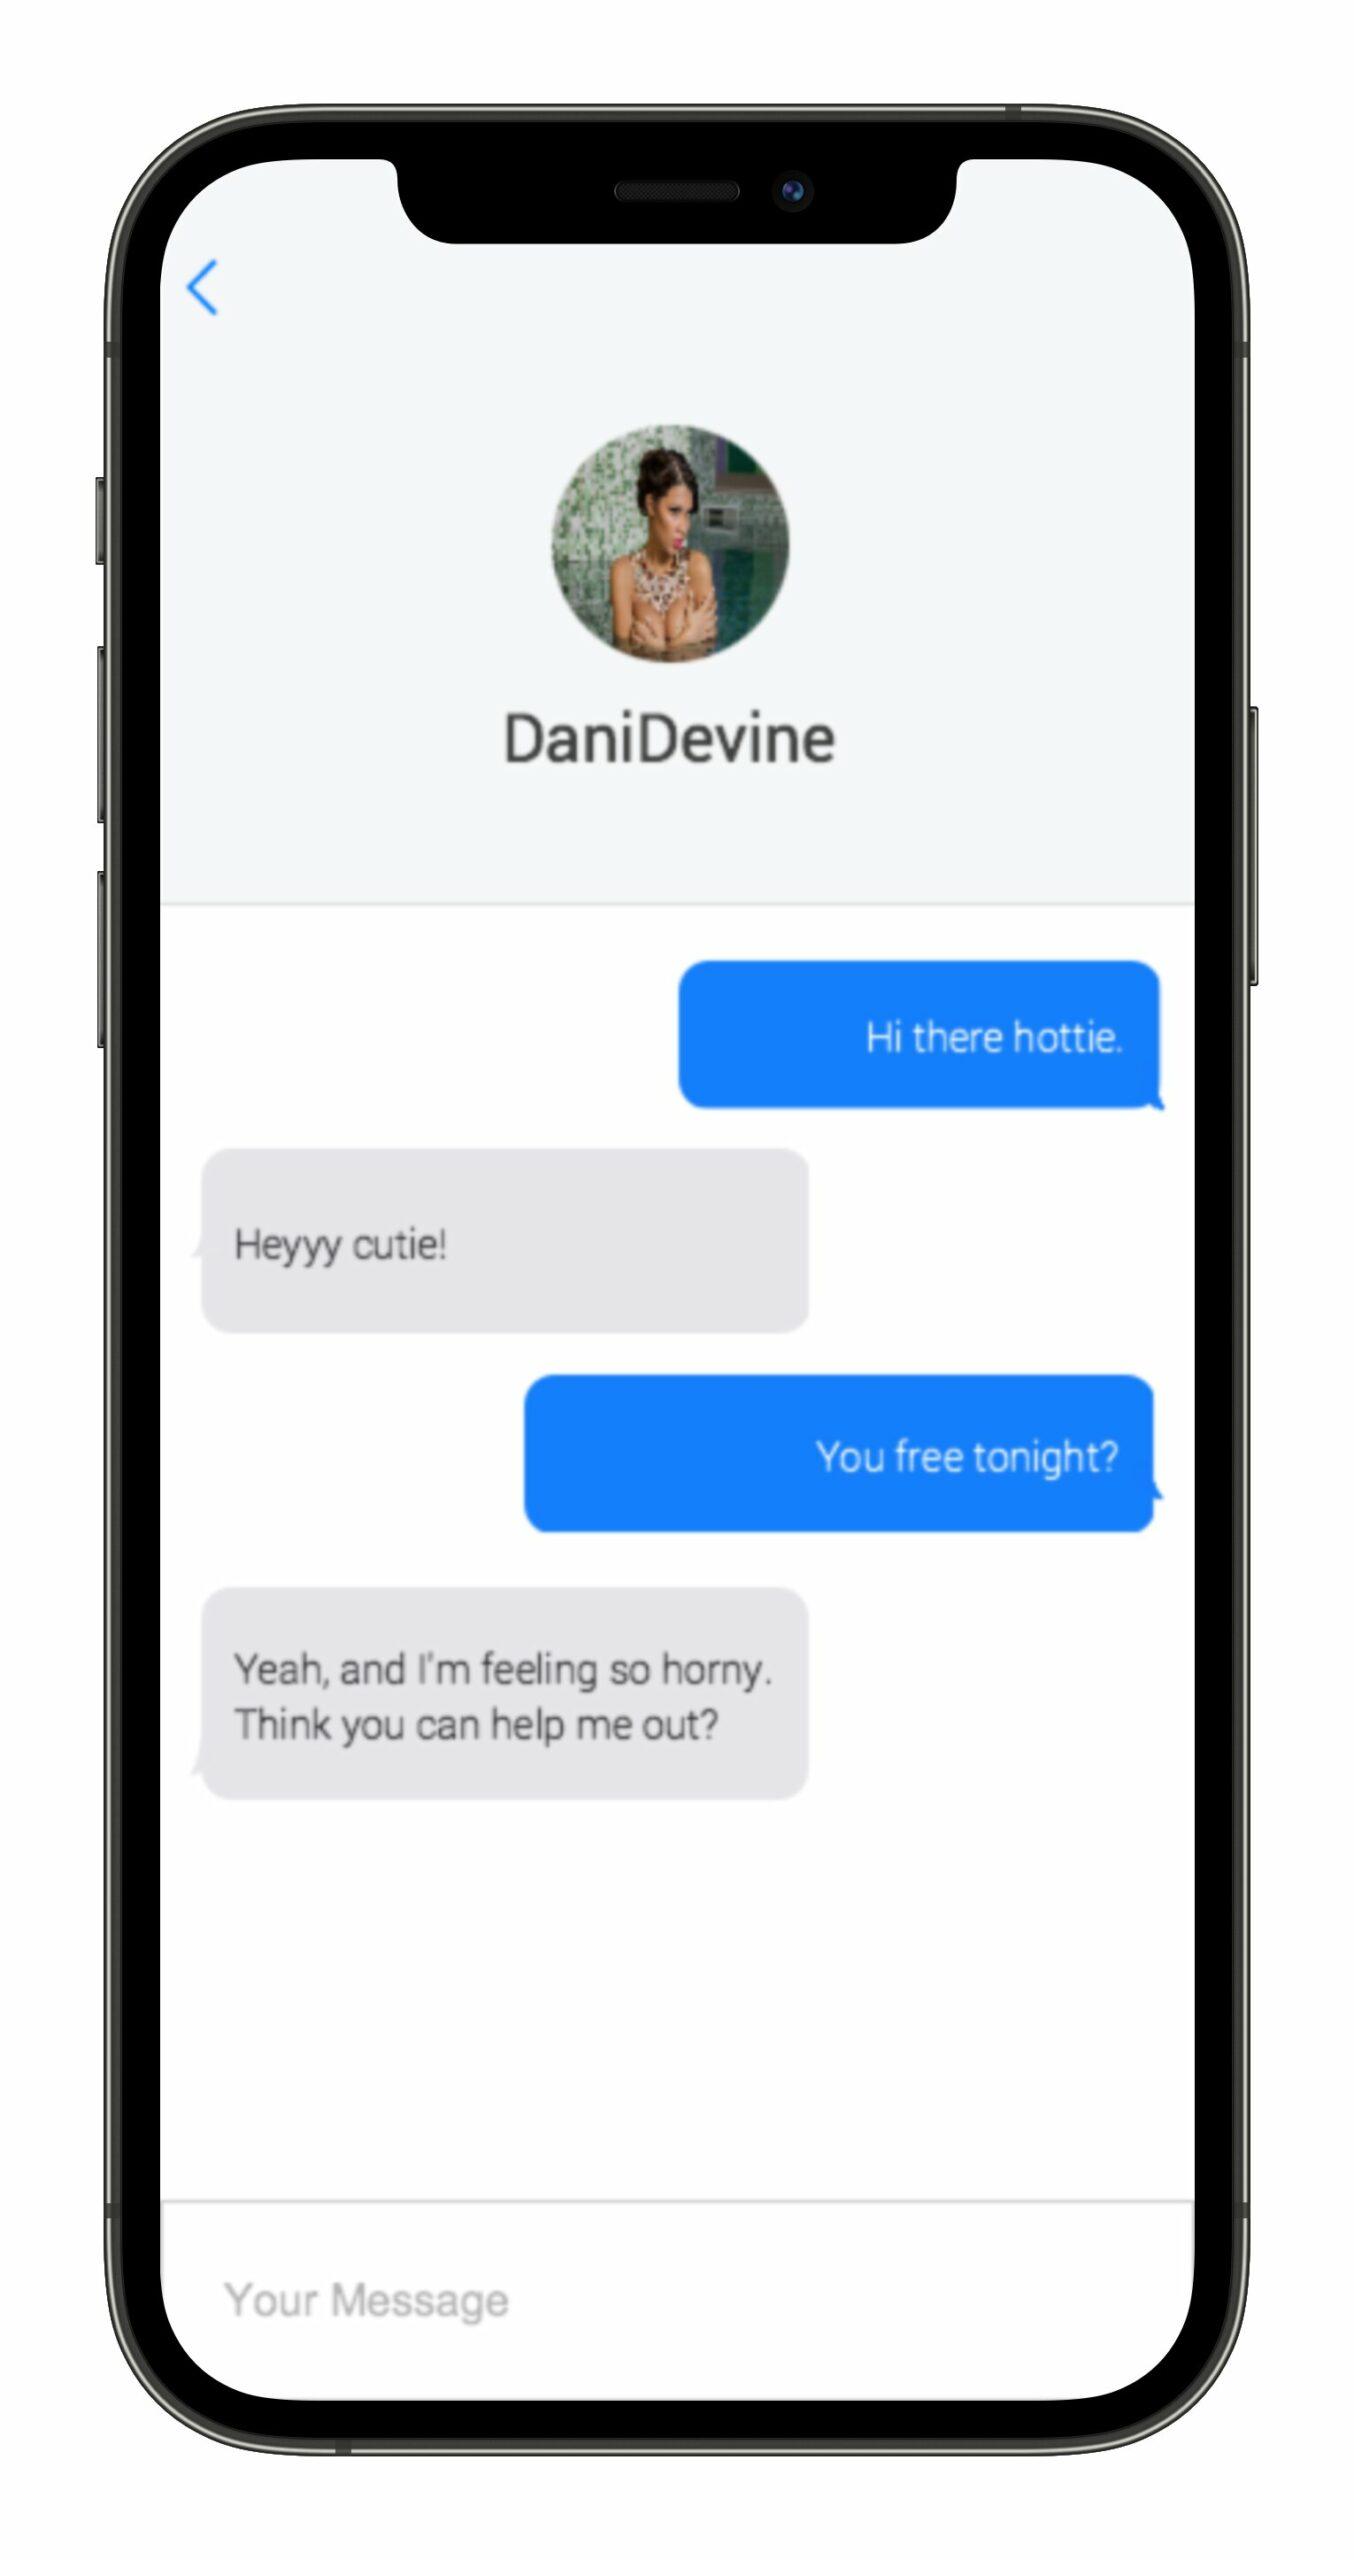 Uberhorny chat screen